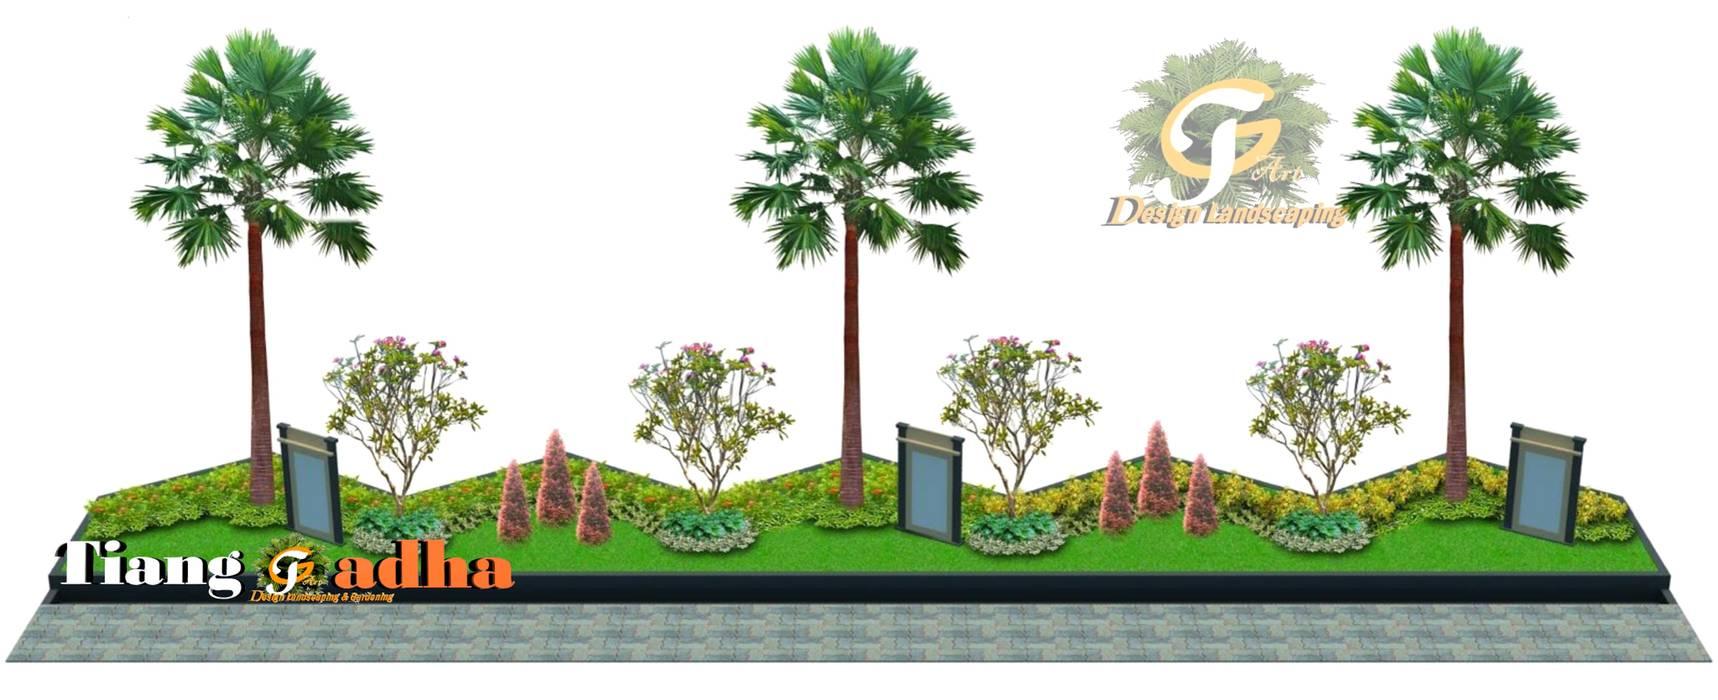 Taman Halaman Depan Pabrik Oleh Tukang Taman Surabaya - Tianggadha-art Modern Batu